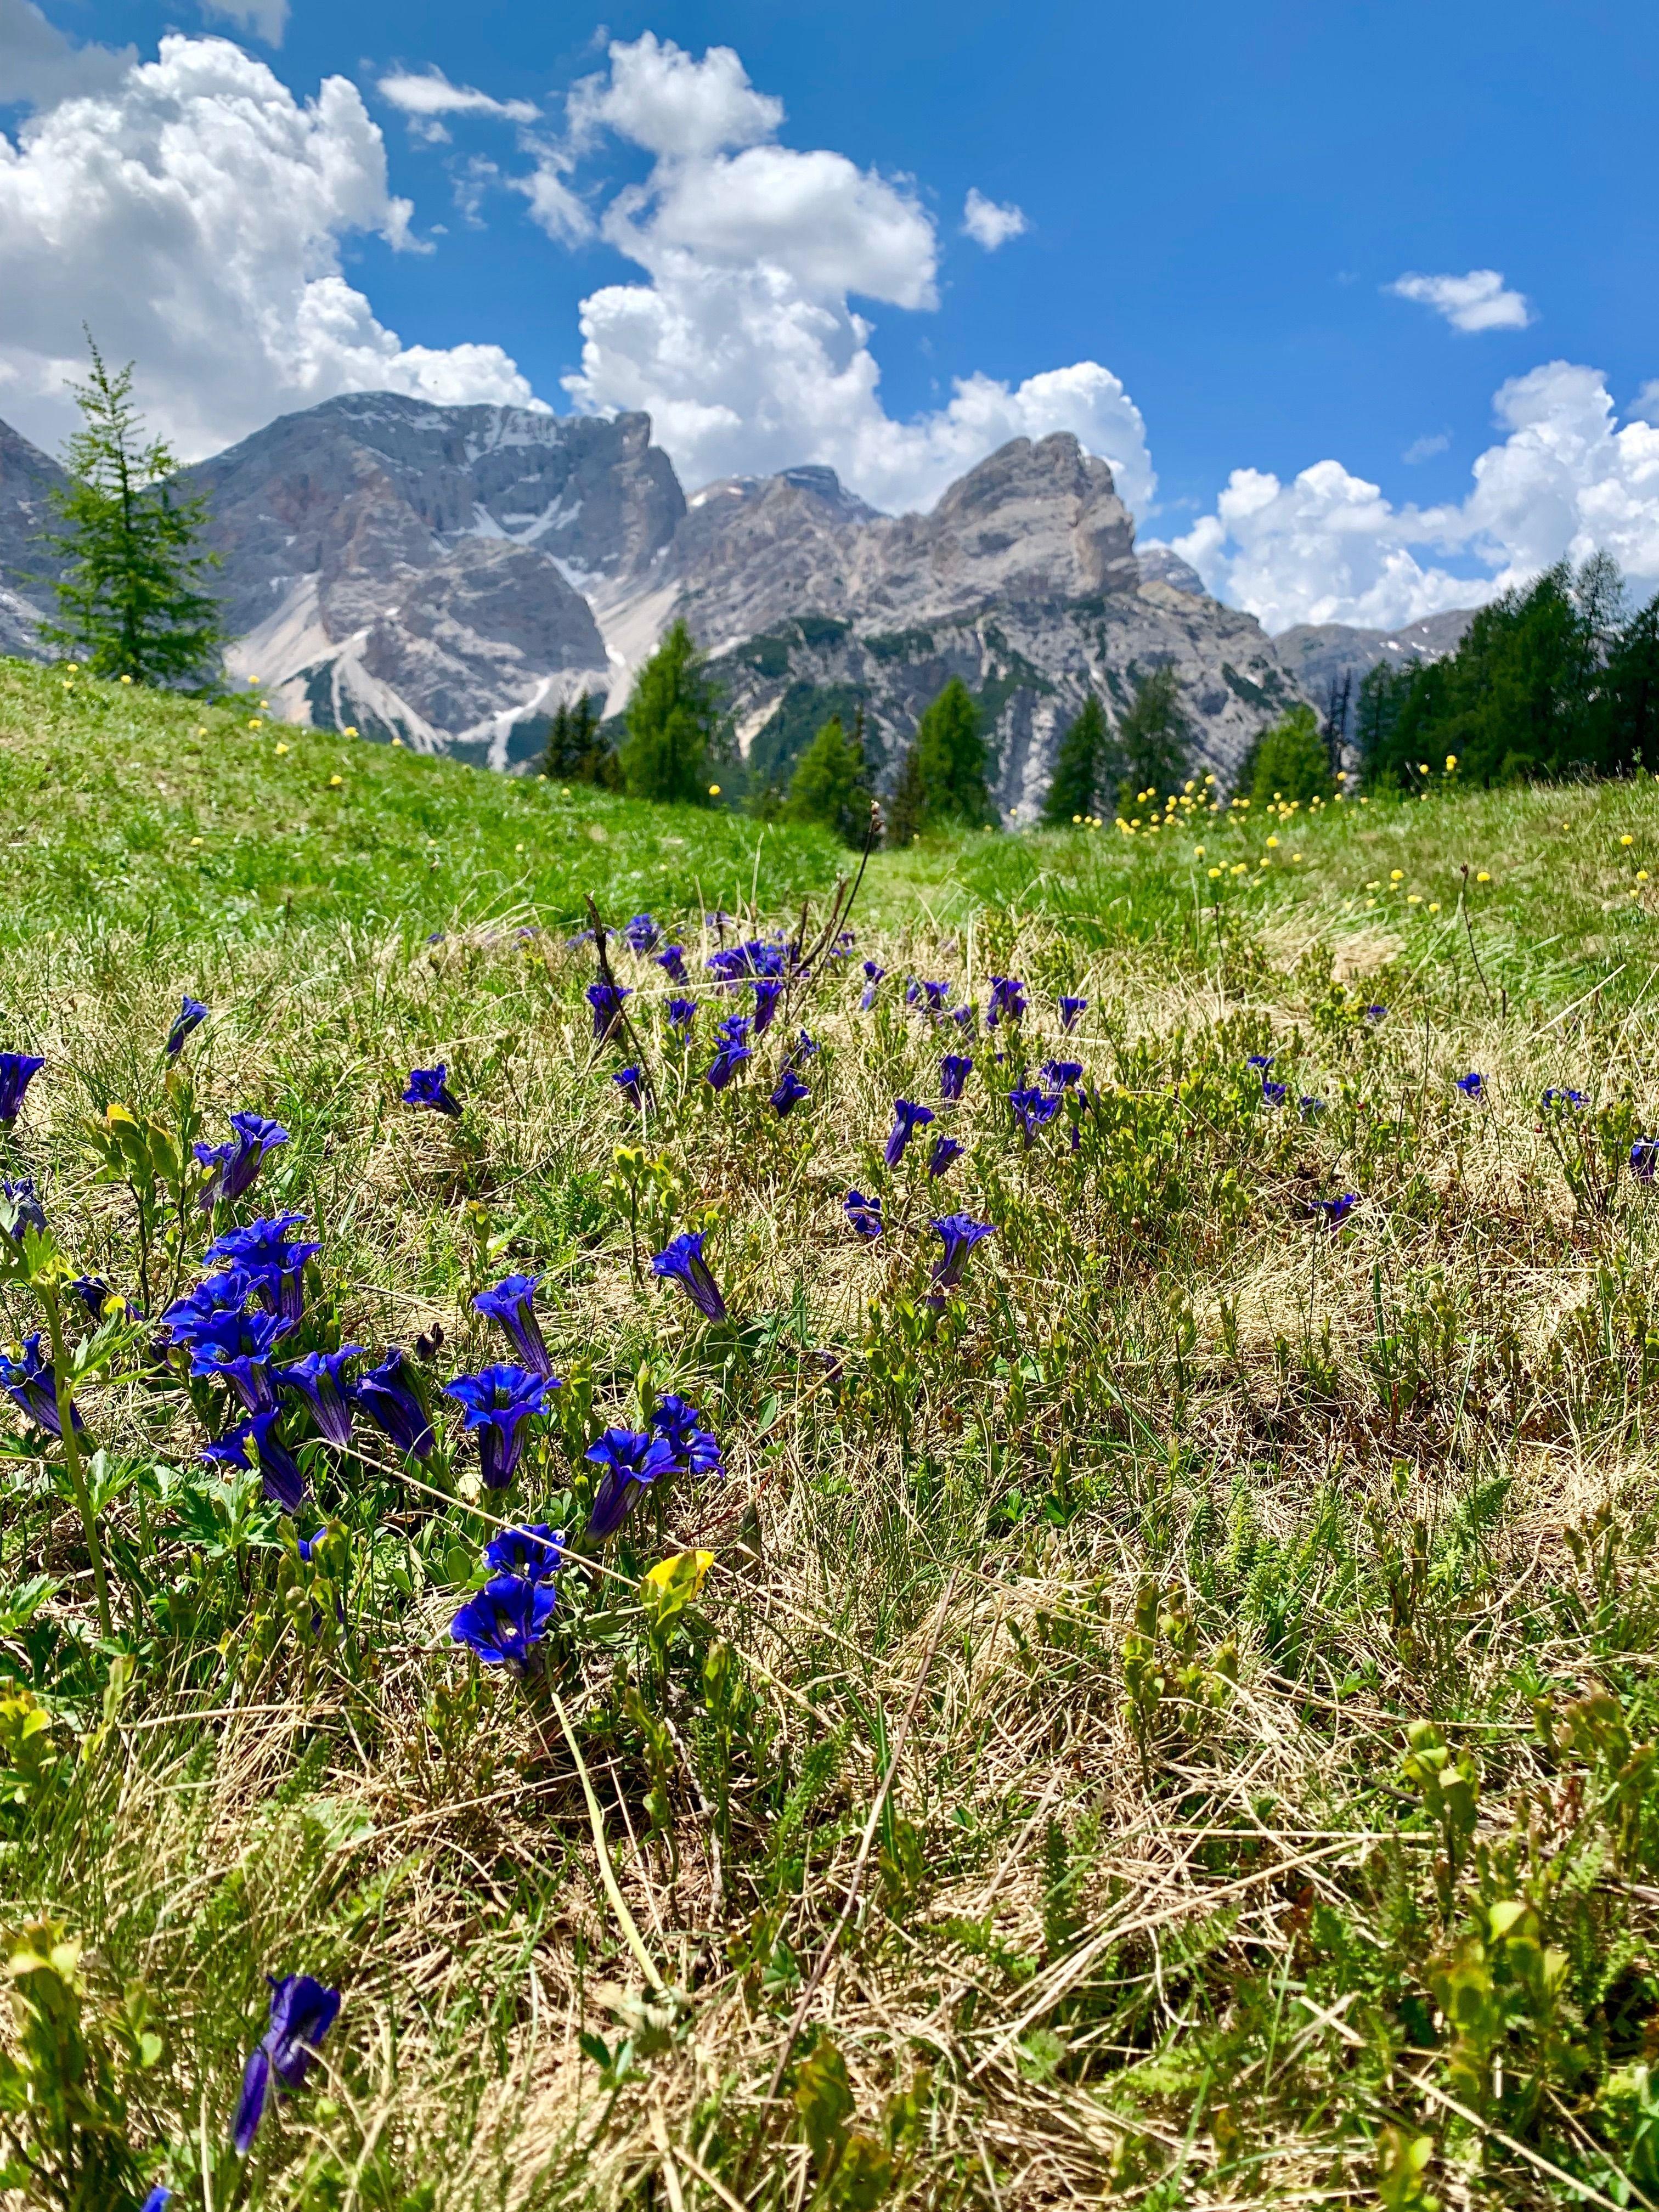 Spectacular Dolomites Hut To Hut Trek With TerraTreks